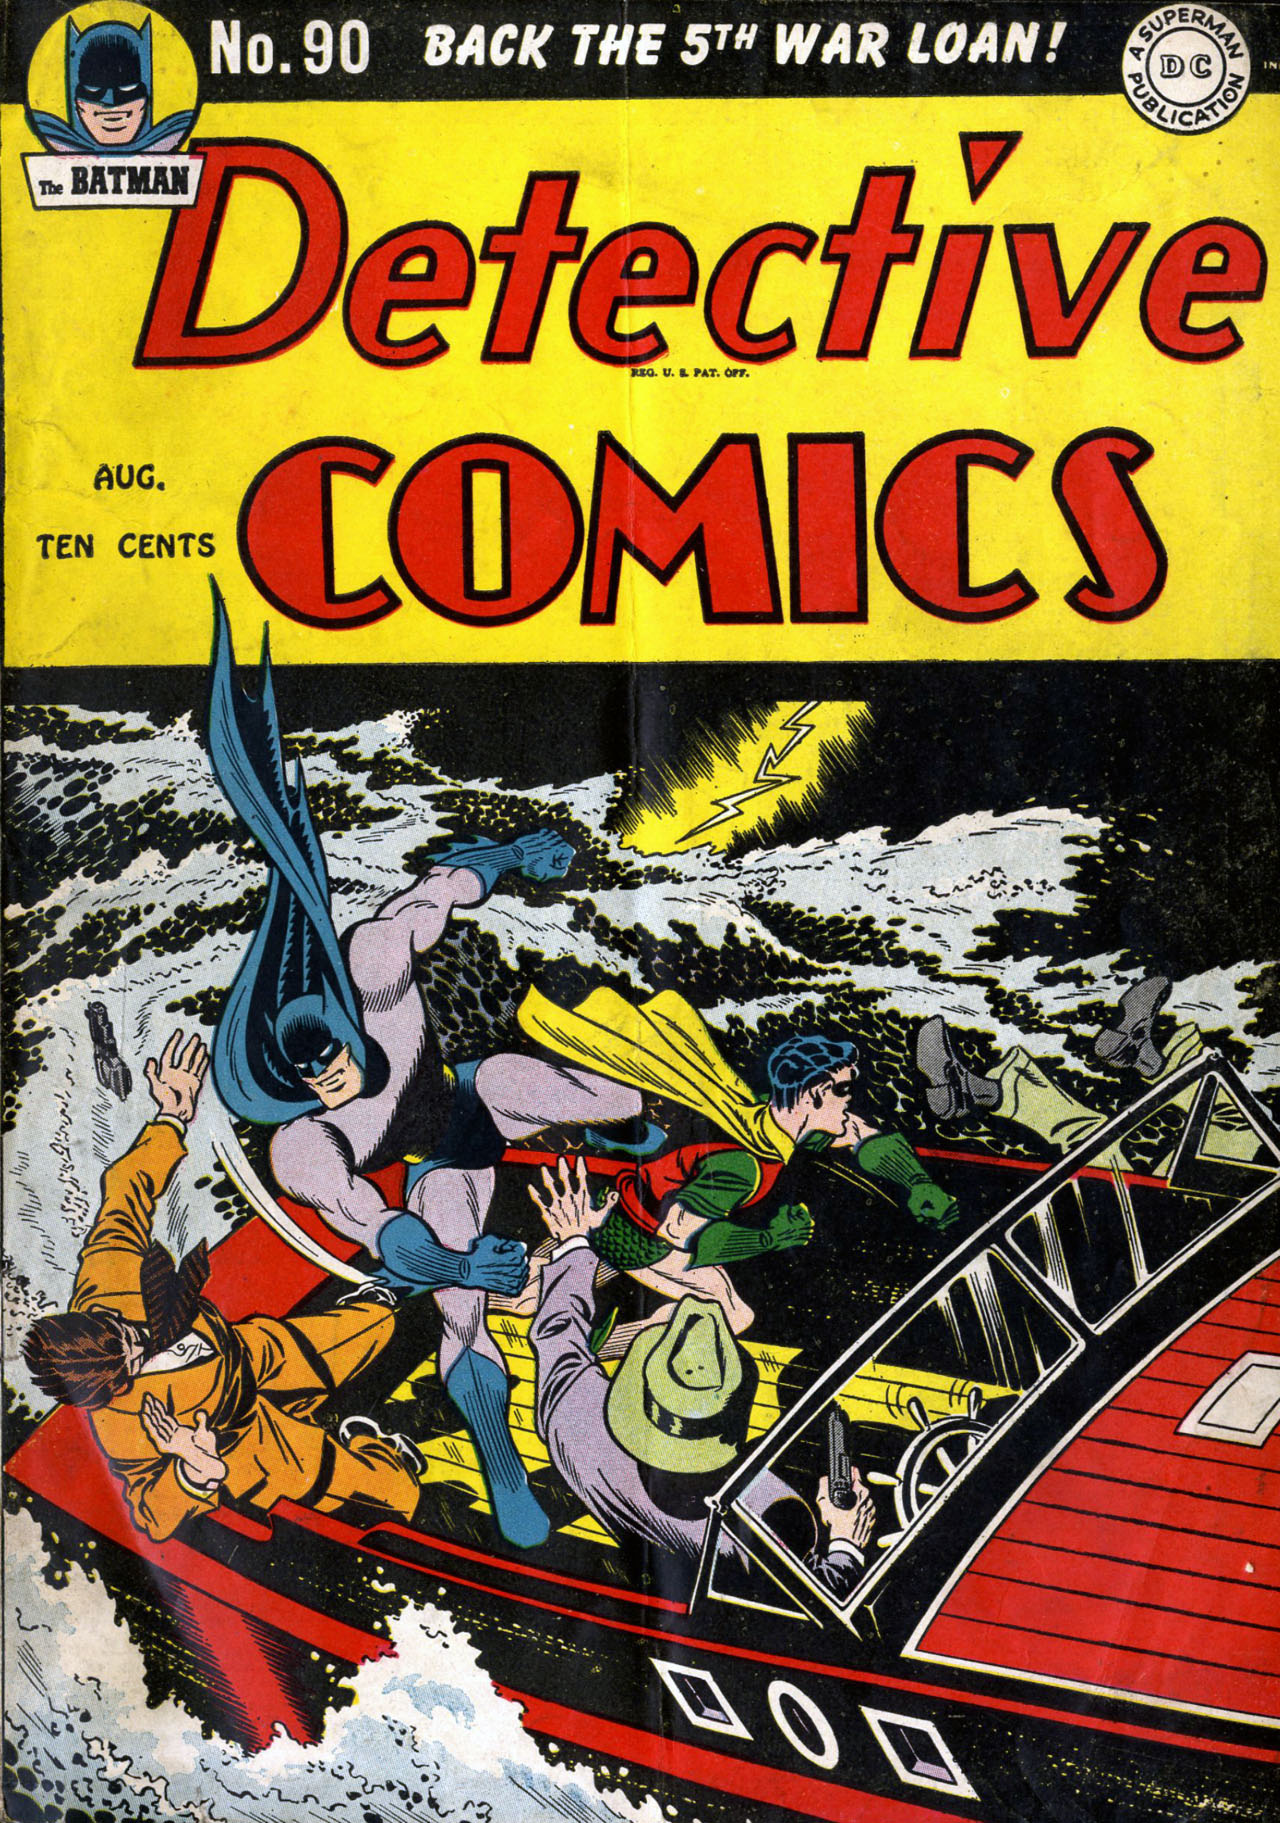 Read online Detective Comics (1937) comic -  Issue #90 - 1